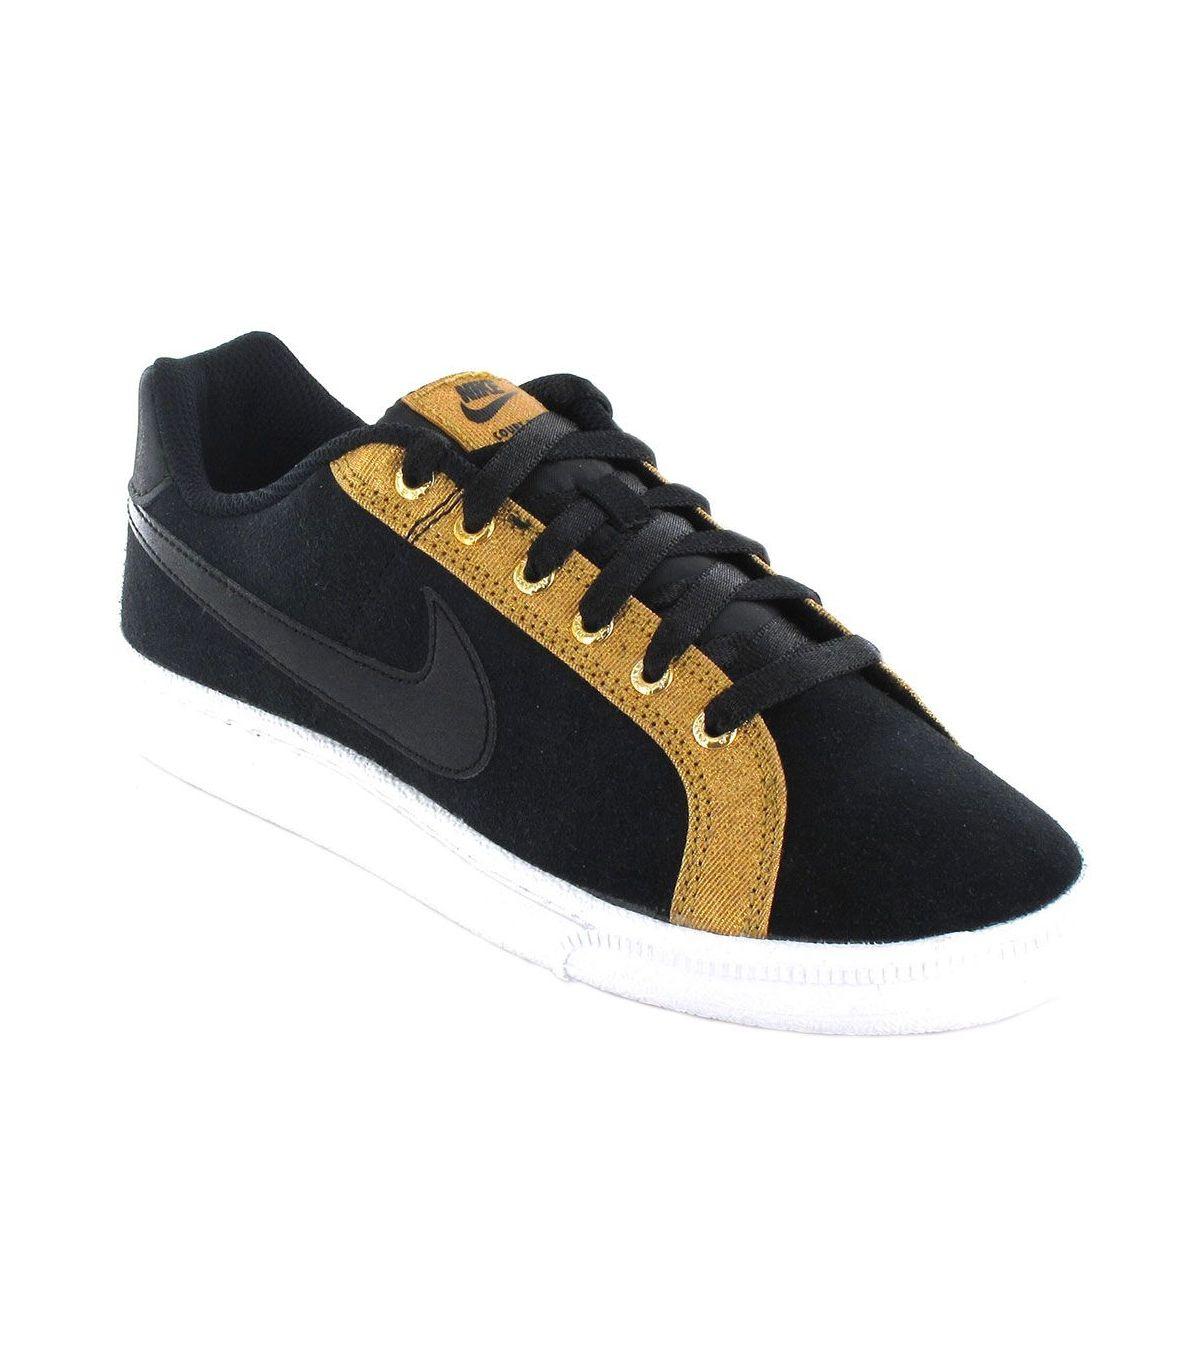 Nike Court Royale Prem W Nike Calzado Casual Mujer Lifestyle Tallas: 37,5, 38, 39, 40, 41; Color: negro